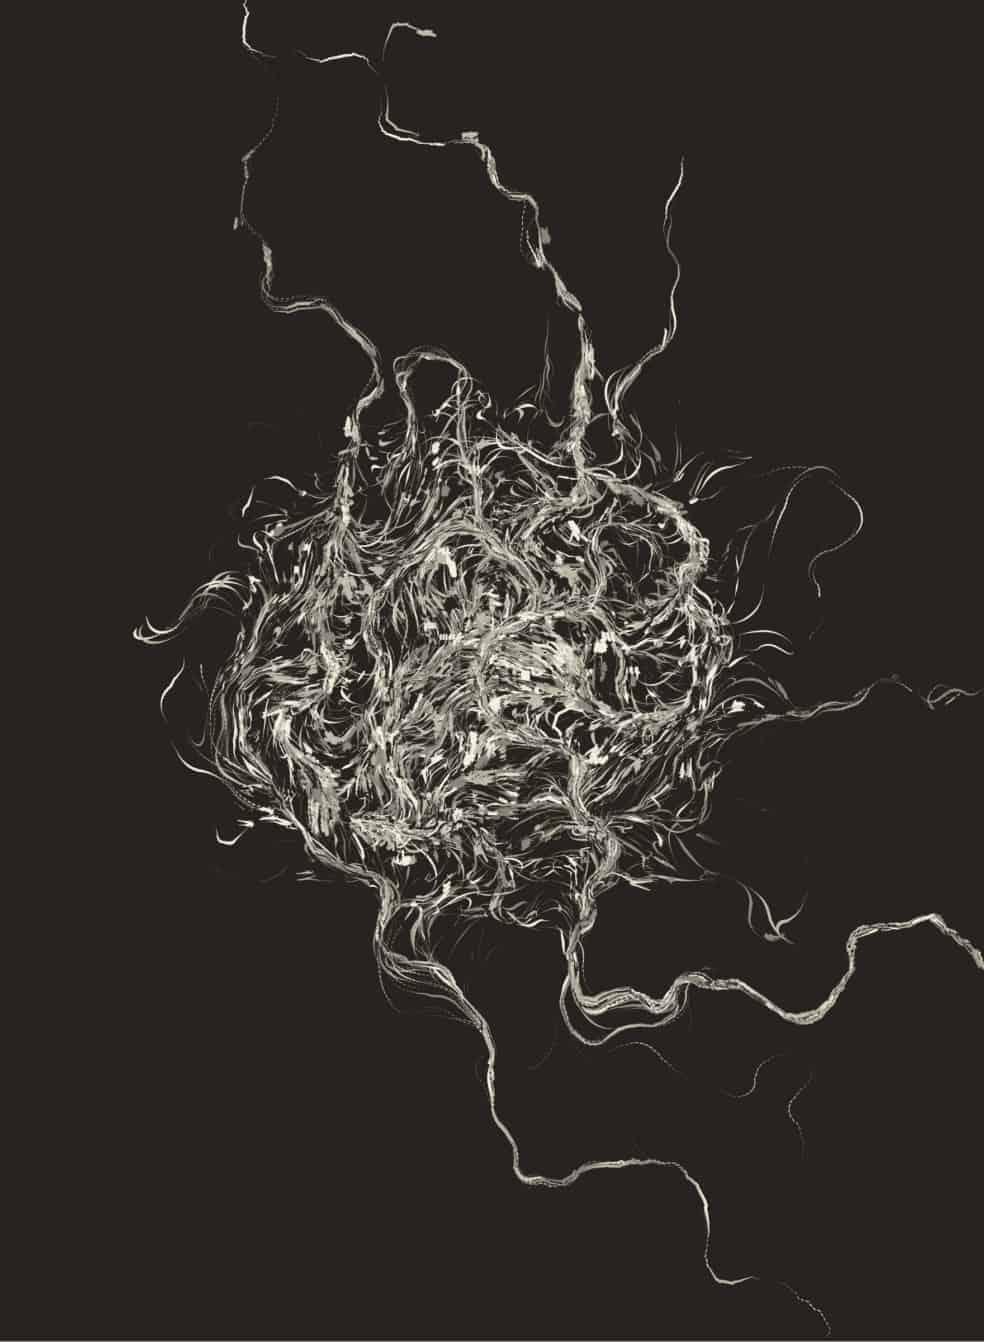 FLow Fiel Generative art javascript 02